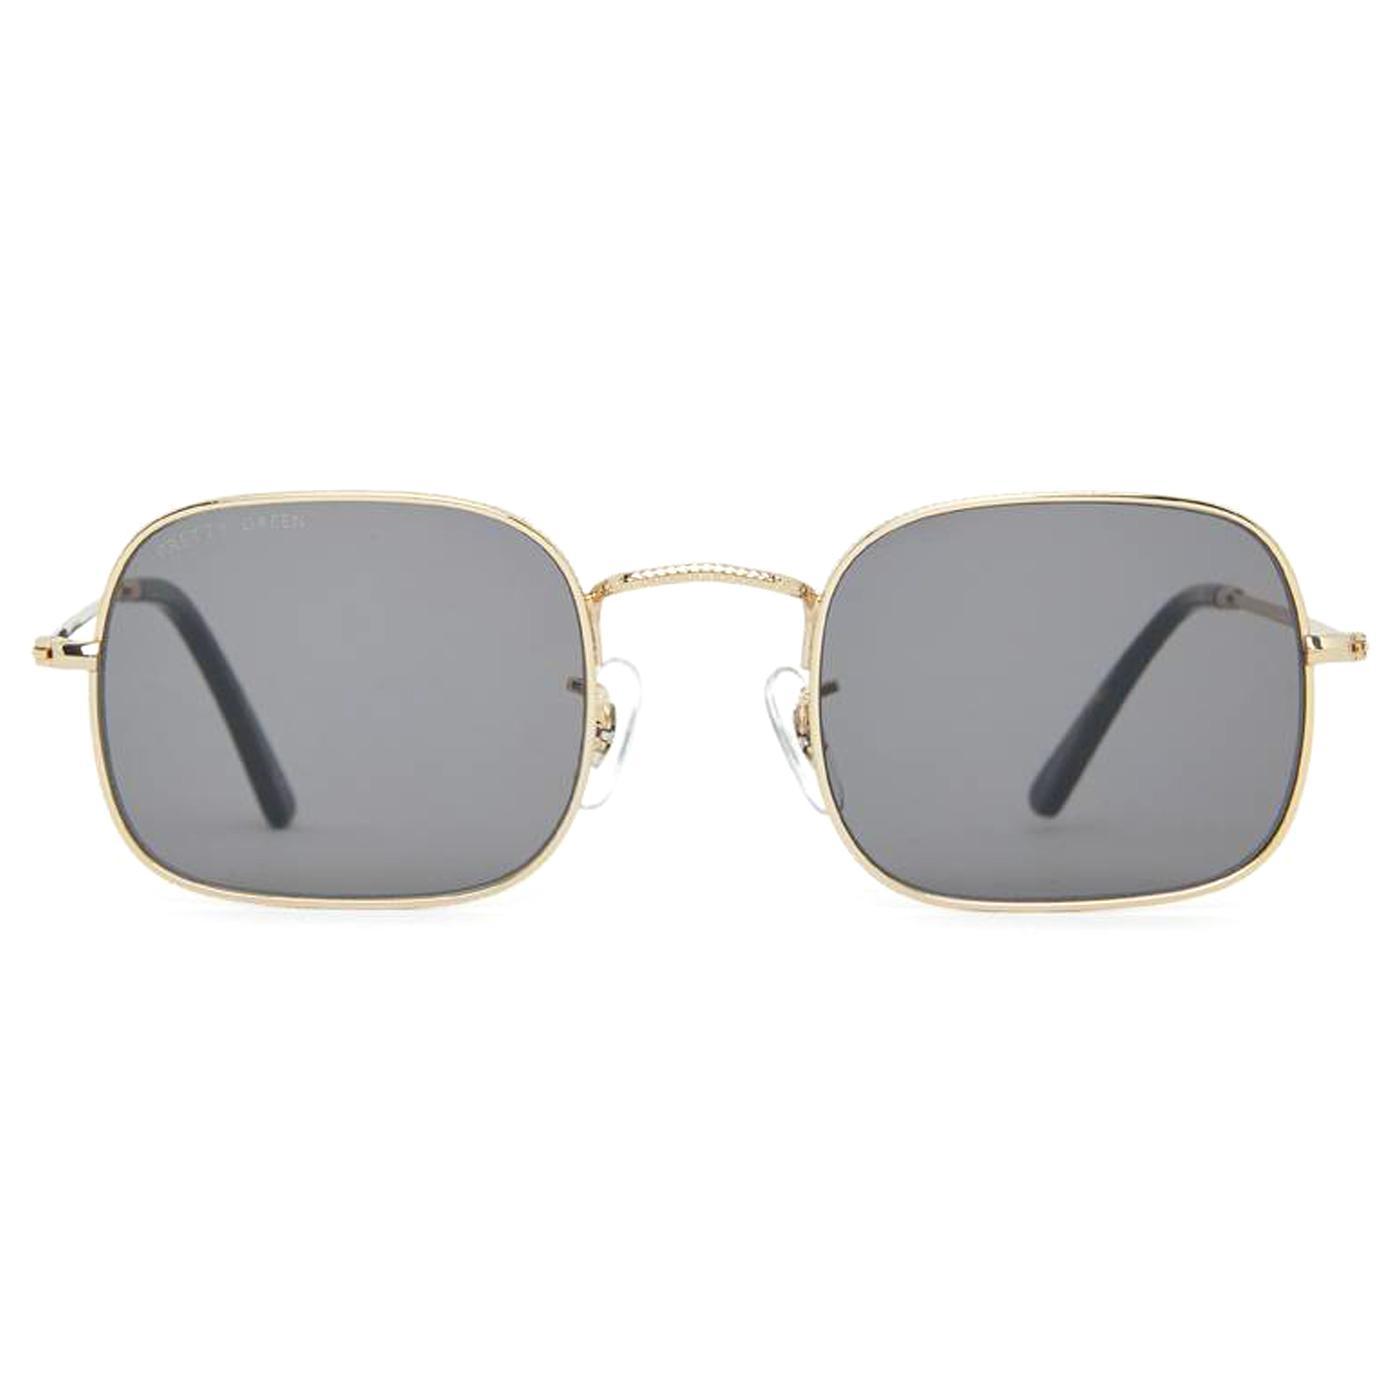 S8AMU0667A519 square sunglasses black